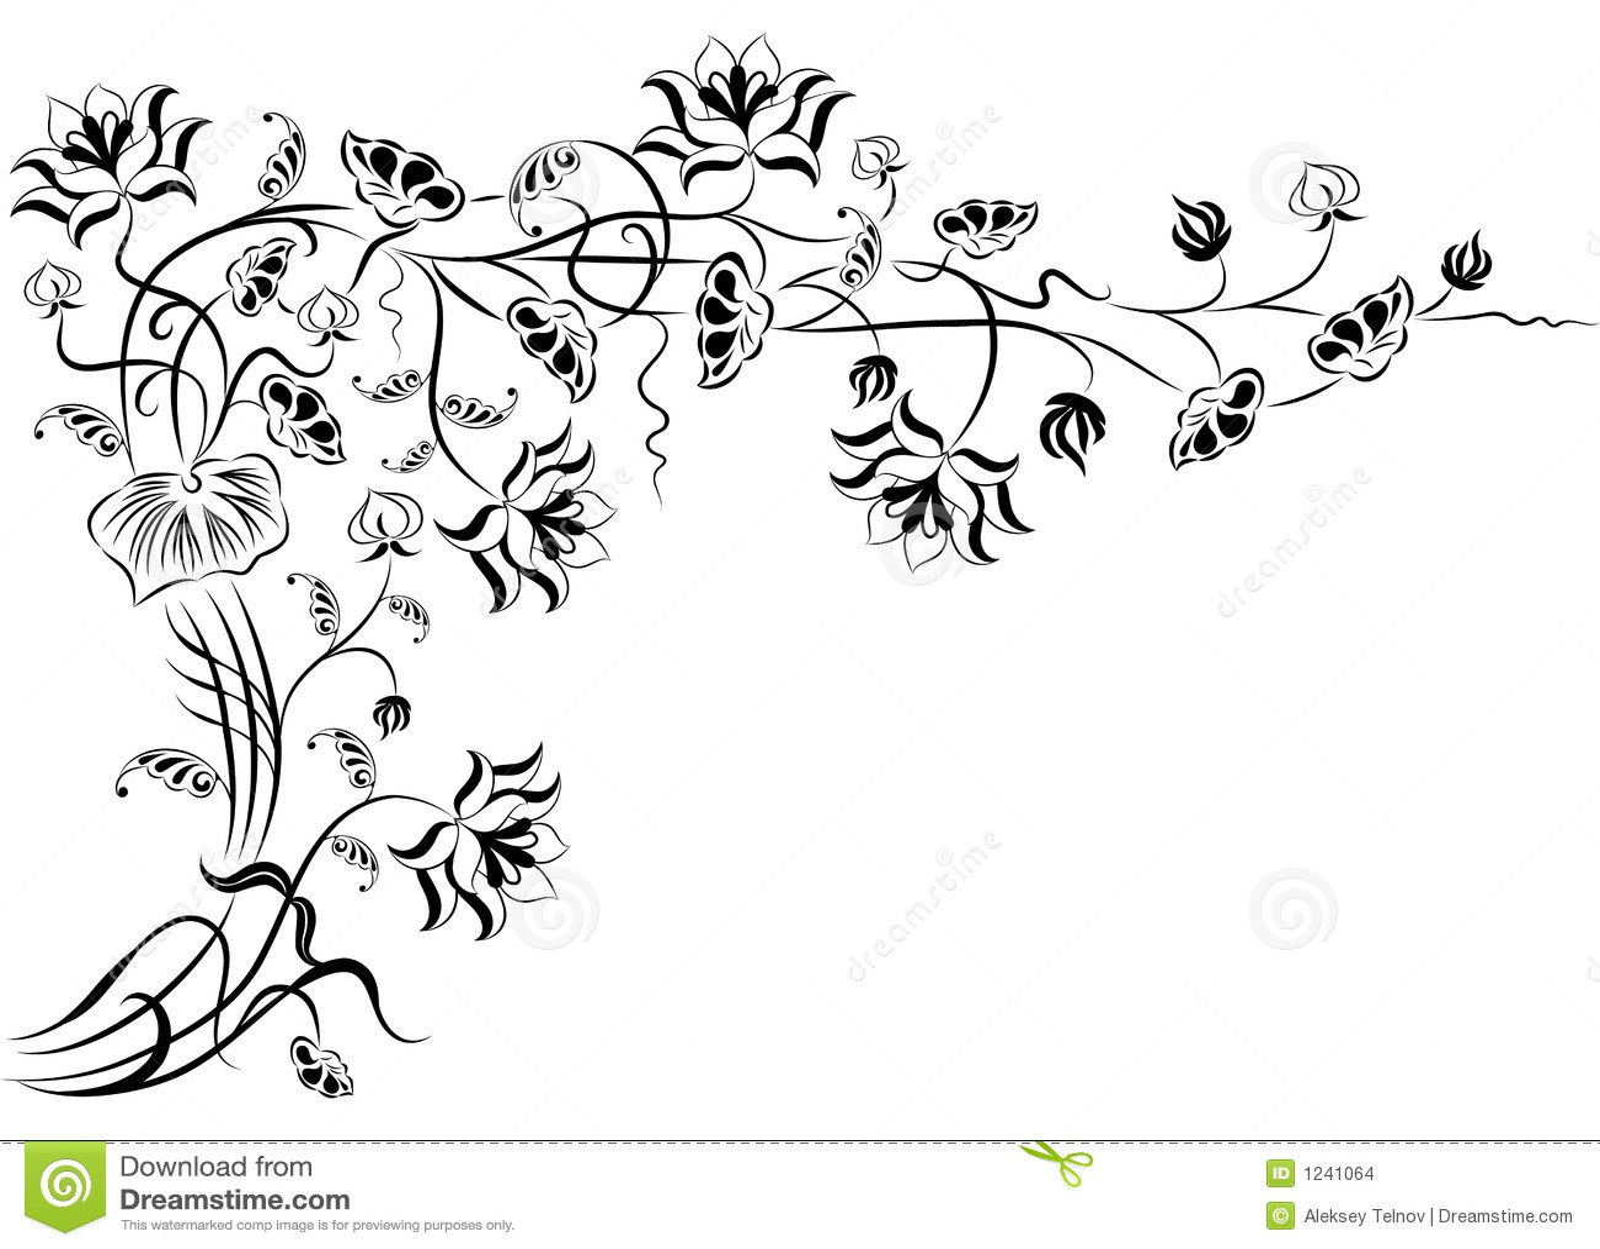 Elemento Para O Projeto Flor De Canto Vetor Ilustracao